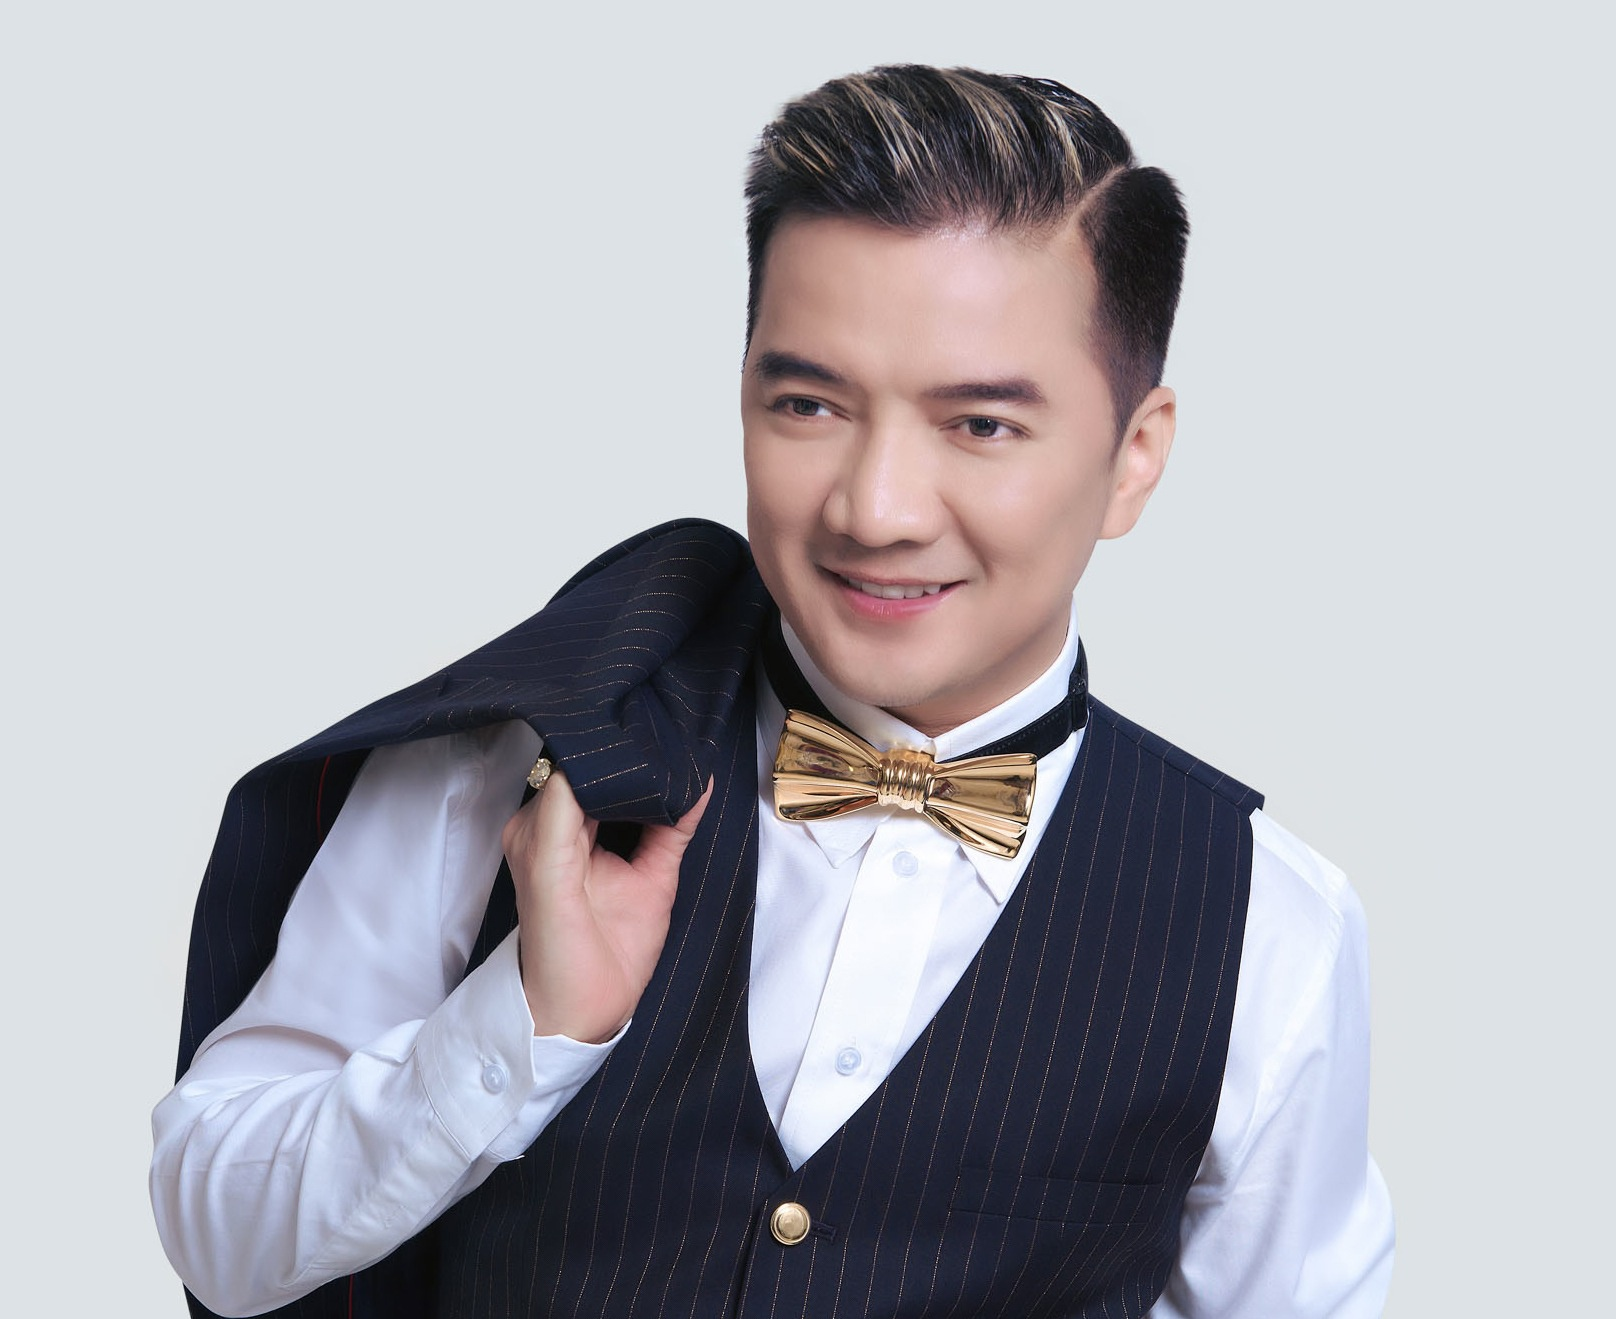 Tin don Nha Phuong cuoi Truong Giang duoc tim kiem nhieu tren MXH hinh anh 6